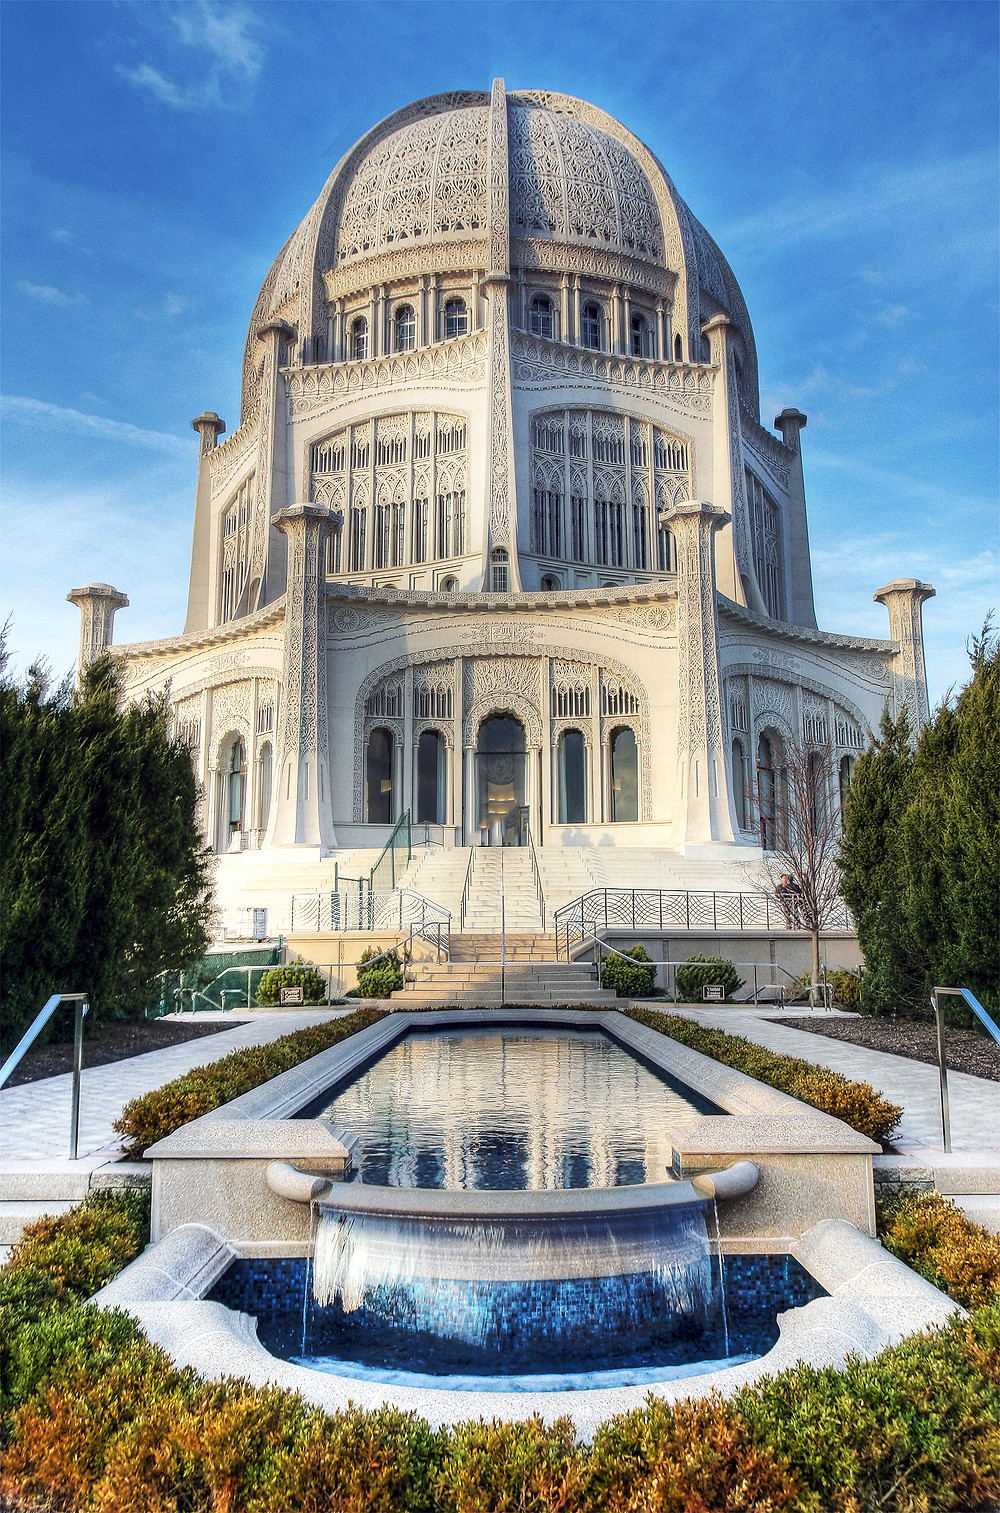 Baha'i house of worship, Wilmette, Illinois